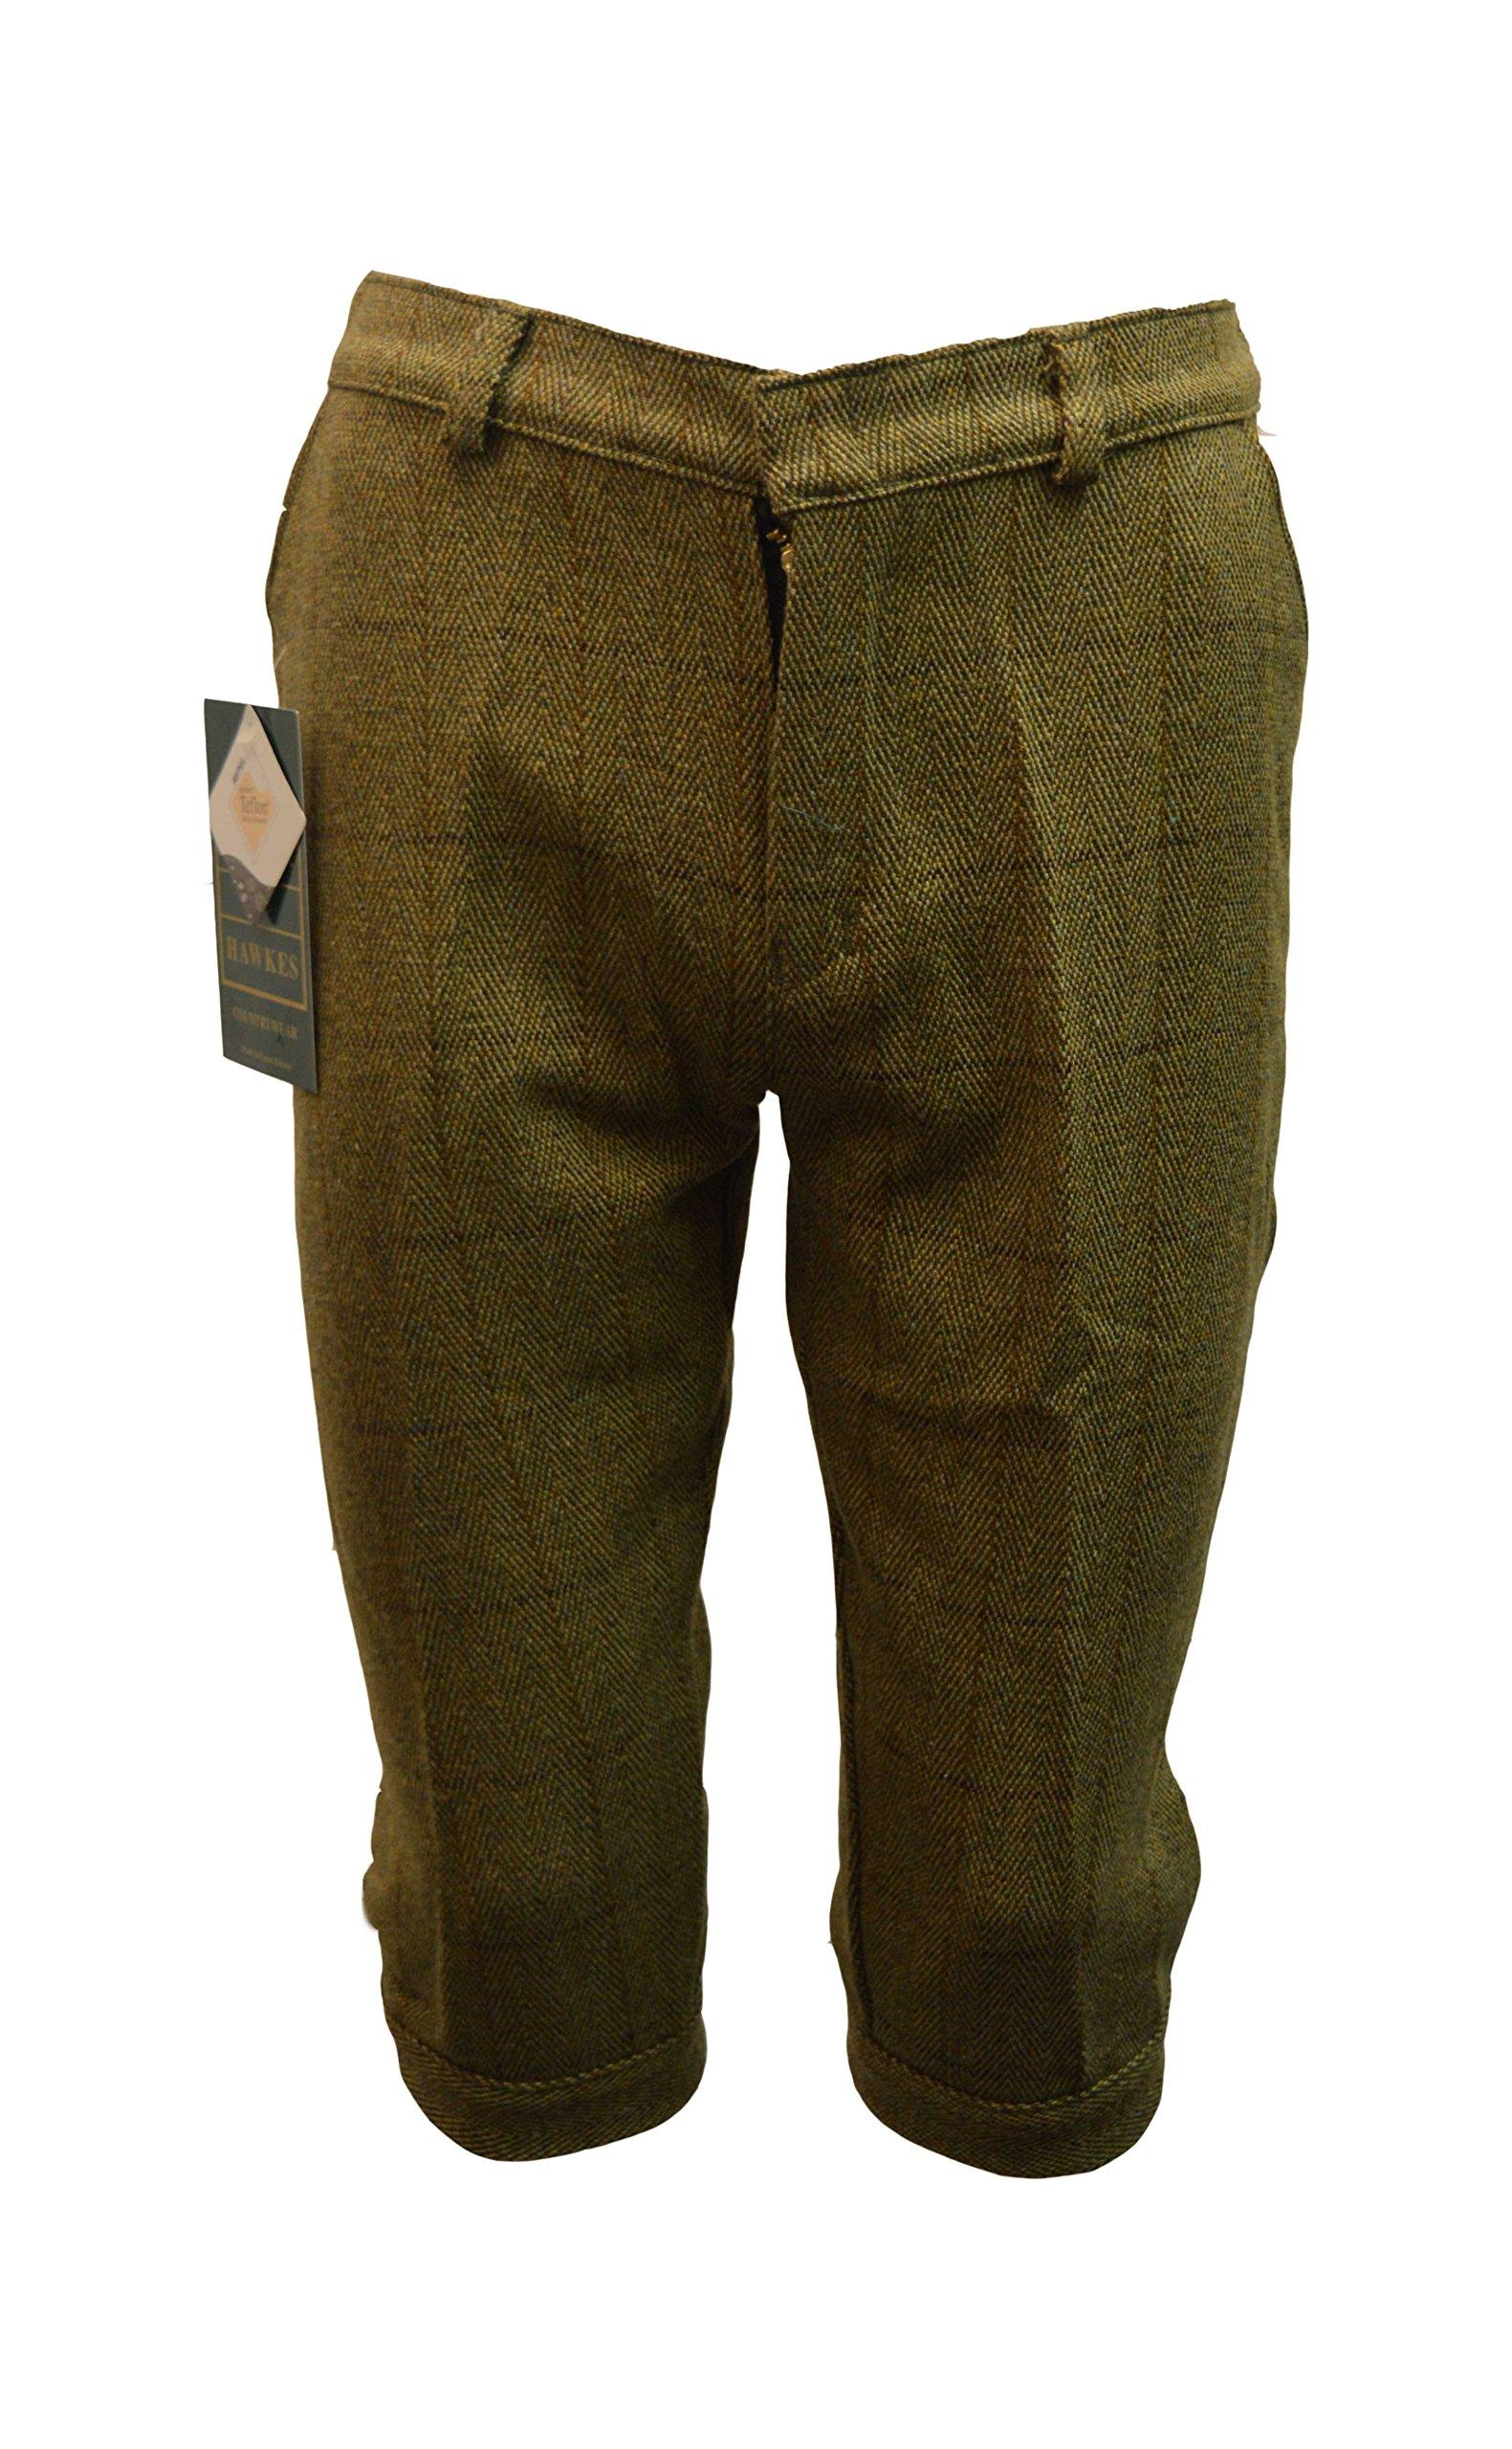 Walker and Hawkes Big Boys' Derby Tweed Breeks Shooting Plus Fours Trousers 26 Light Sage